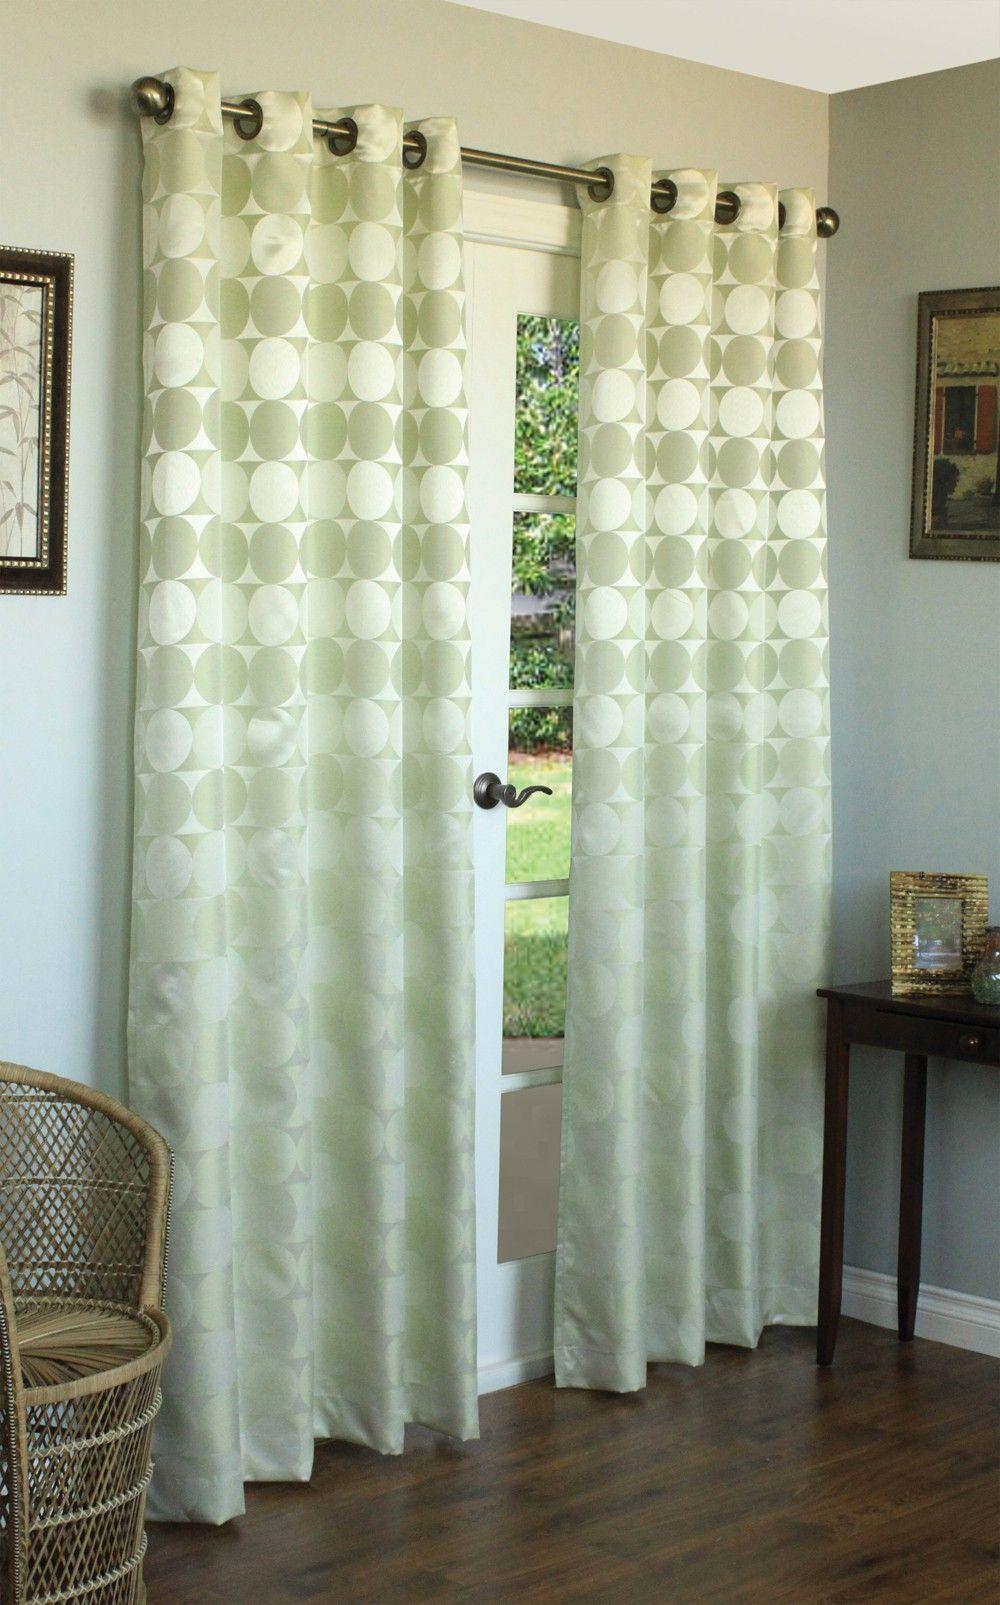 Curtain Bath Outlet Hologram Grommet Curtain Tab Grommet